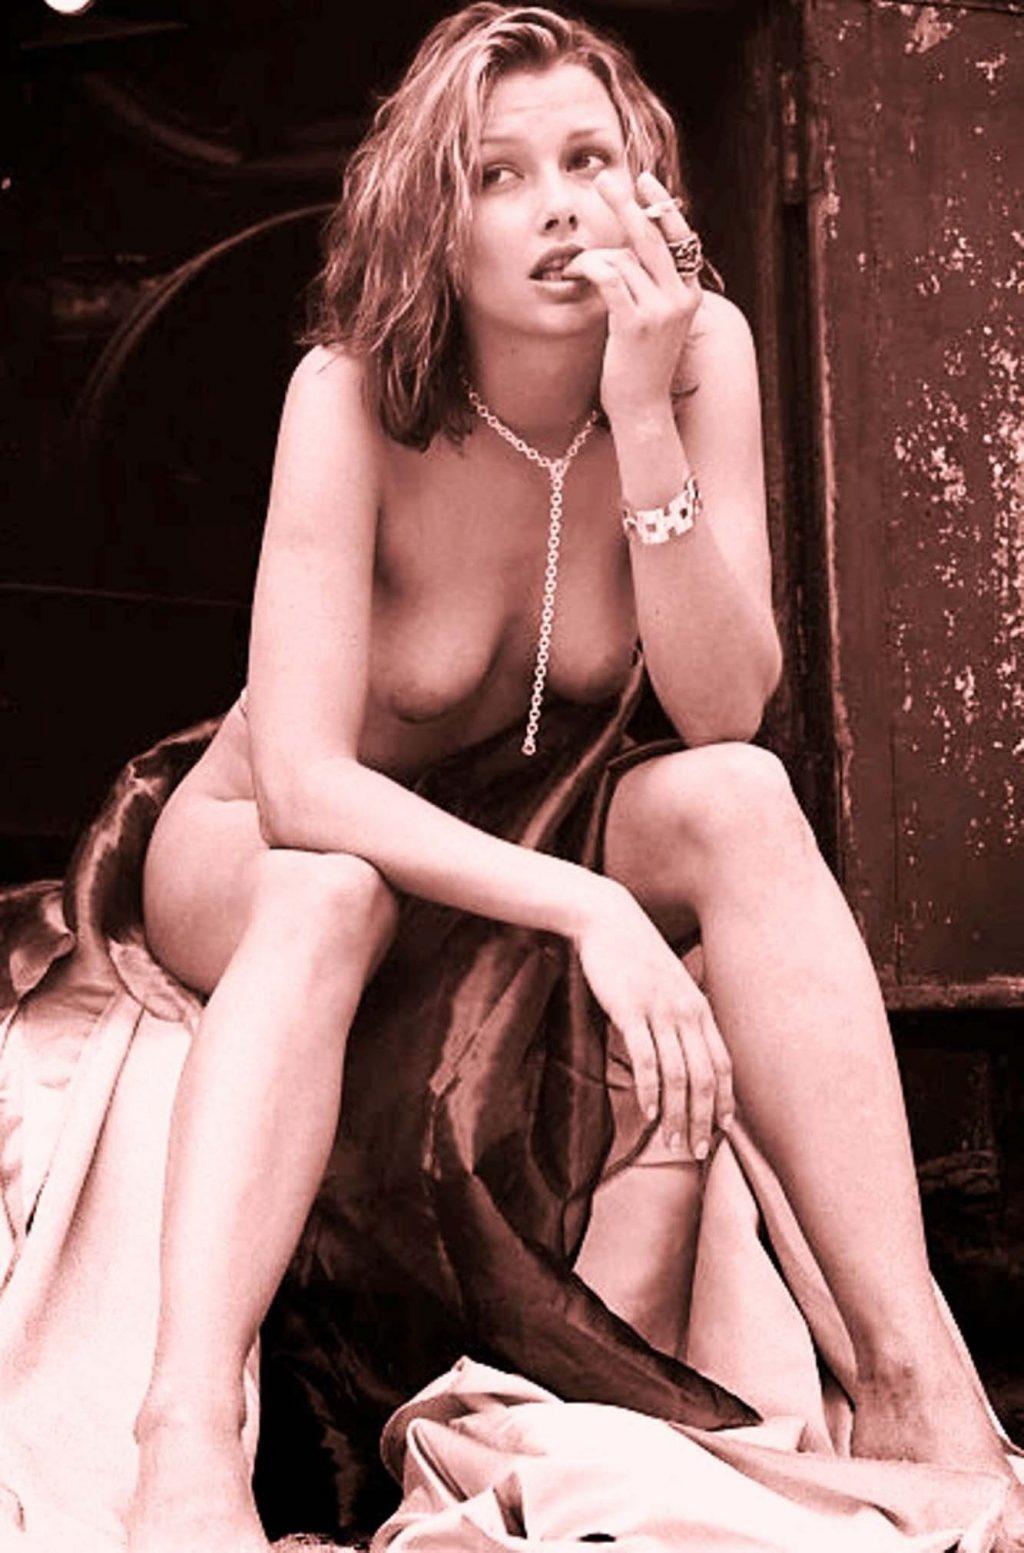 Bridget moynahan tits